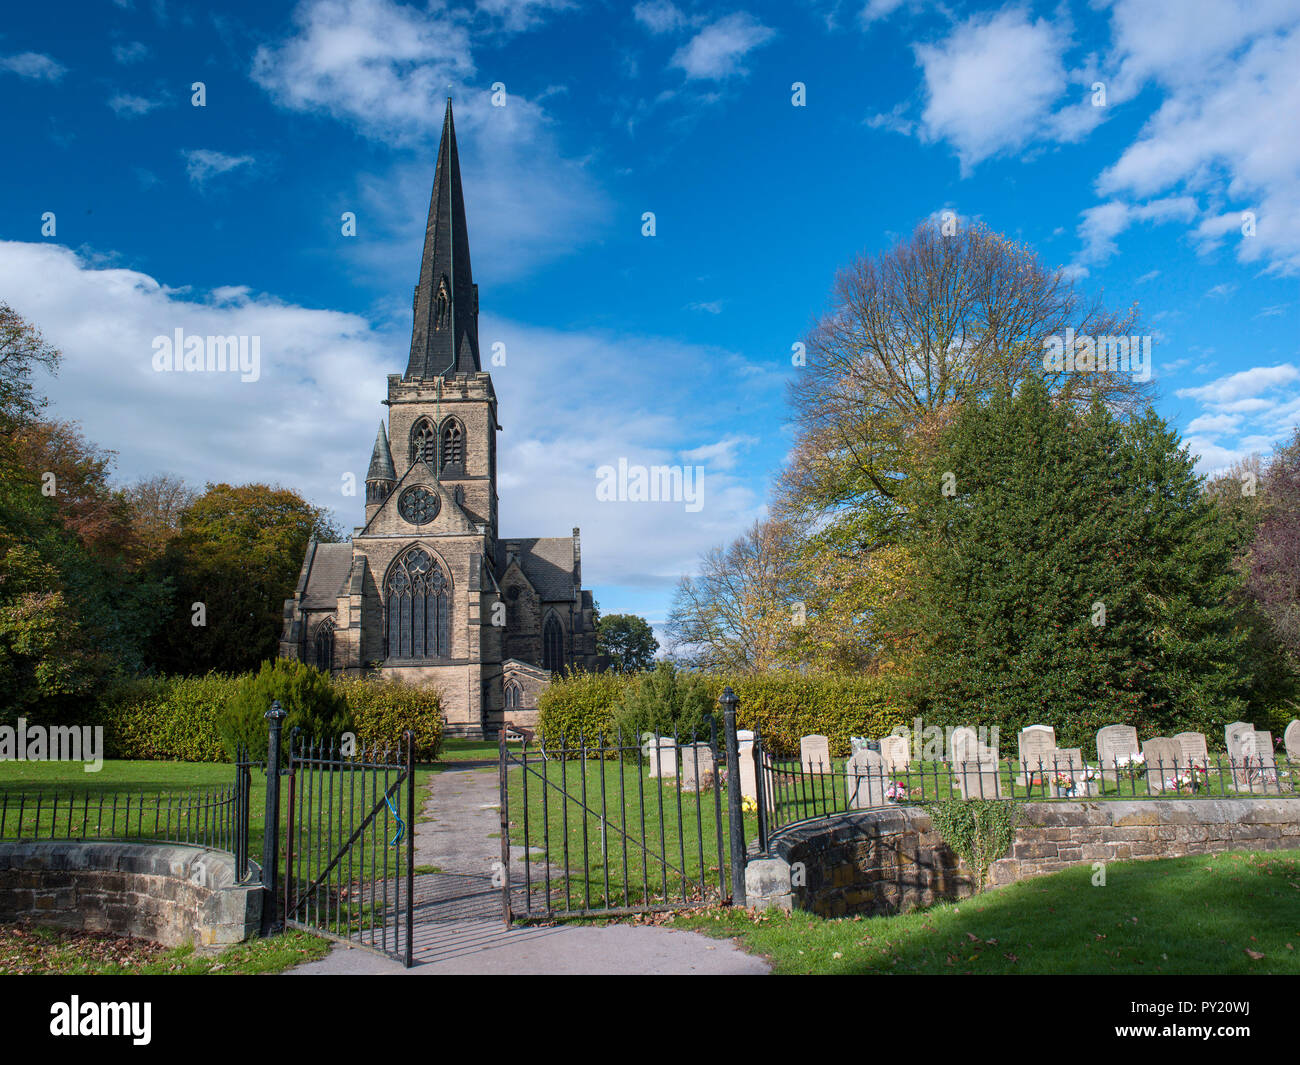 Holy Trinity Parish Church, Wentworth, South Yorkshire, England, United Kingdom, Europe - Stock Image